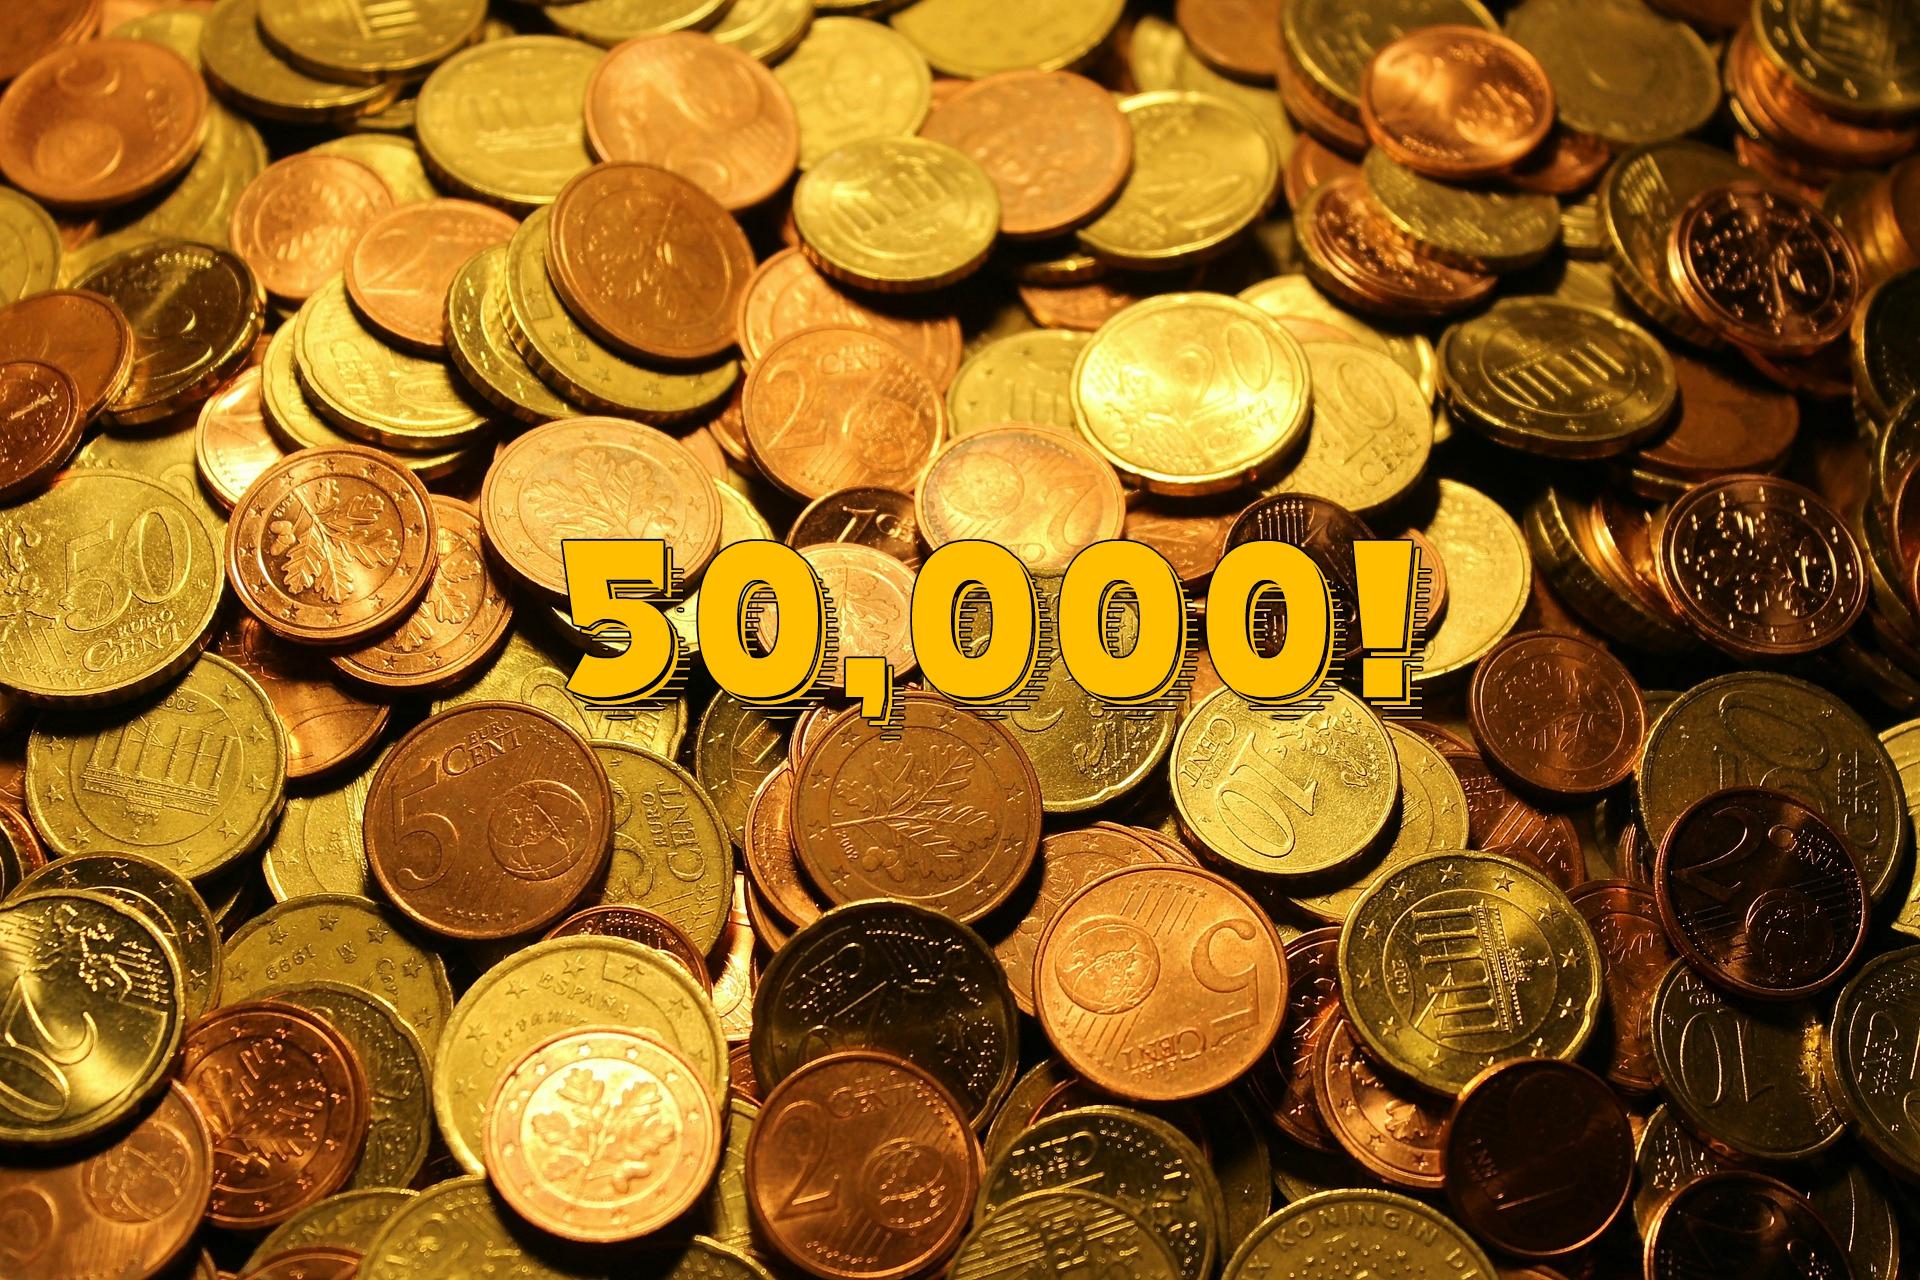 50,000 FM Coins